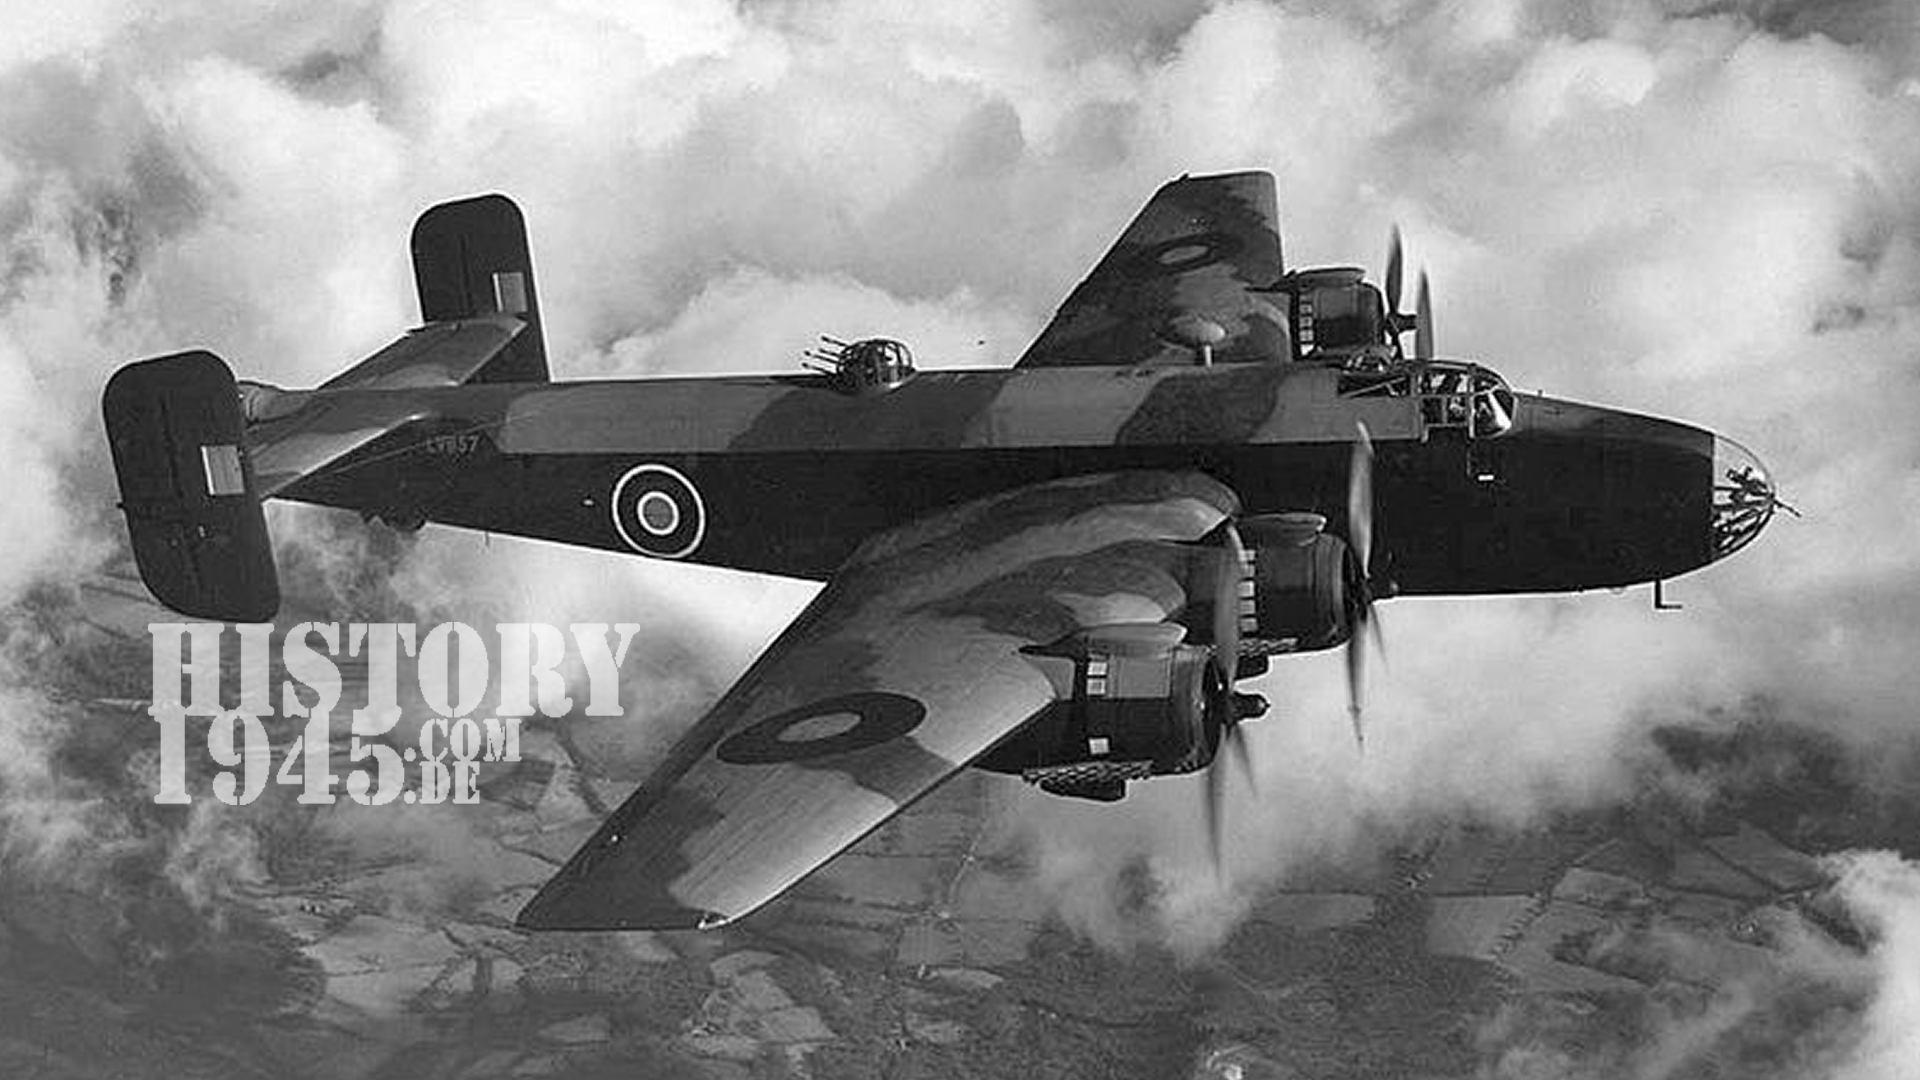 Halifax Mk3 Bomber